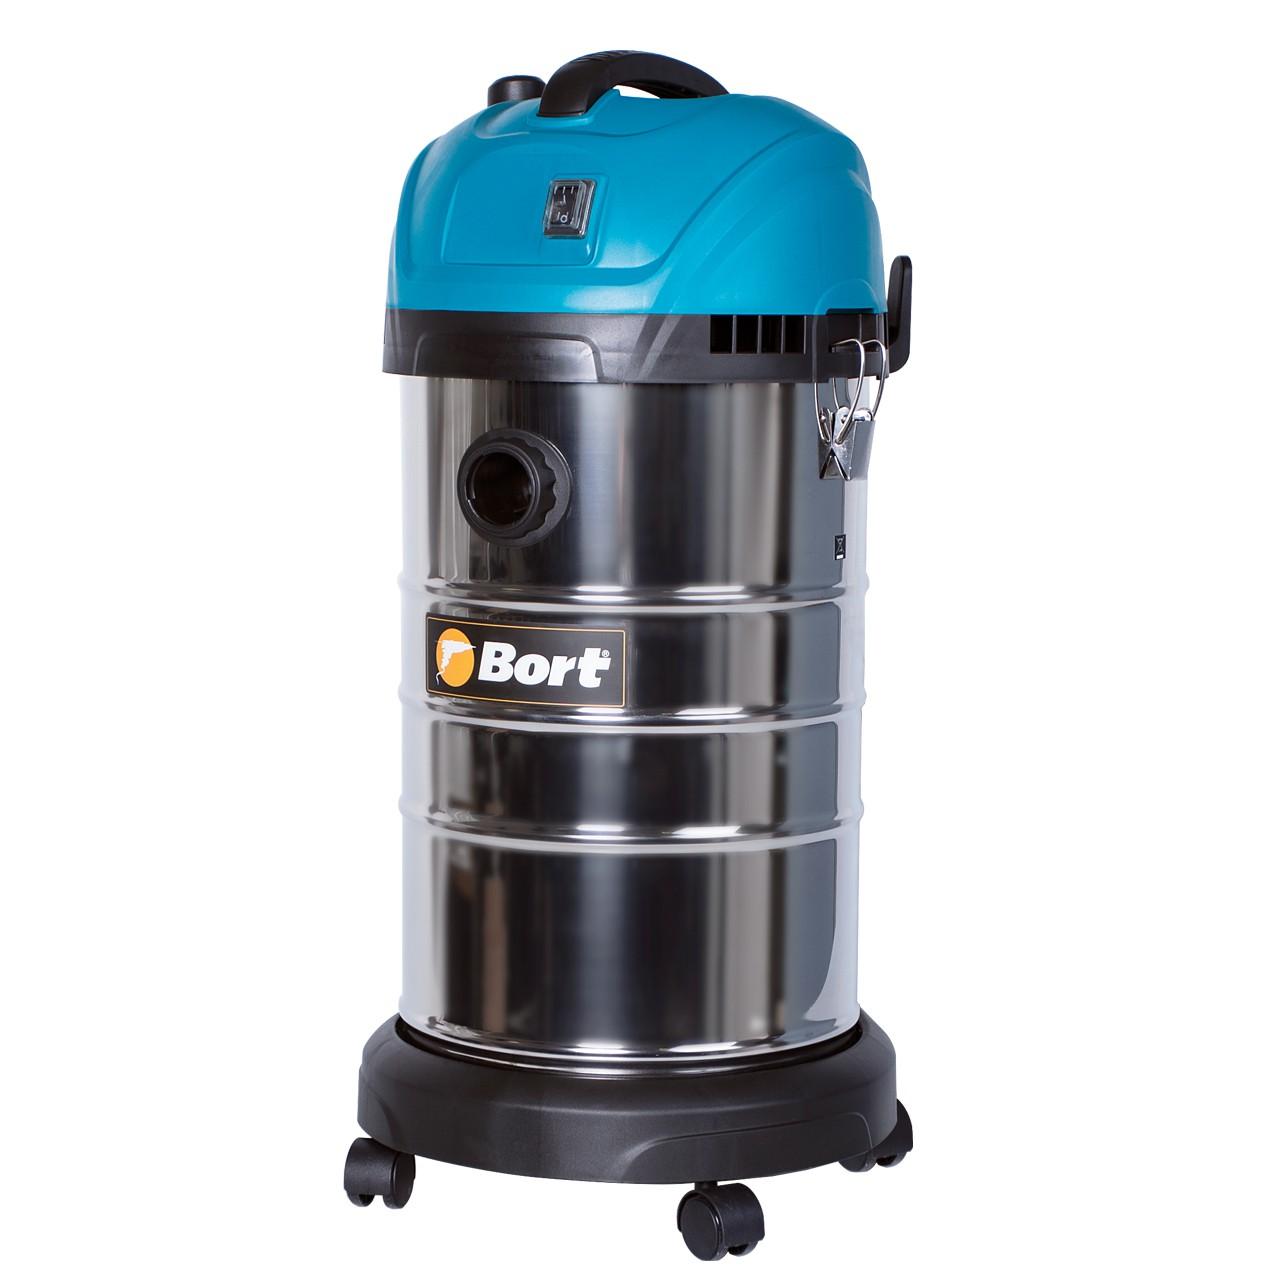 Пылесос Bort BSS-1630 SmartAir